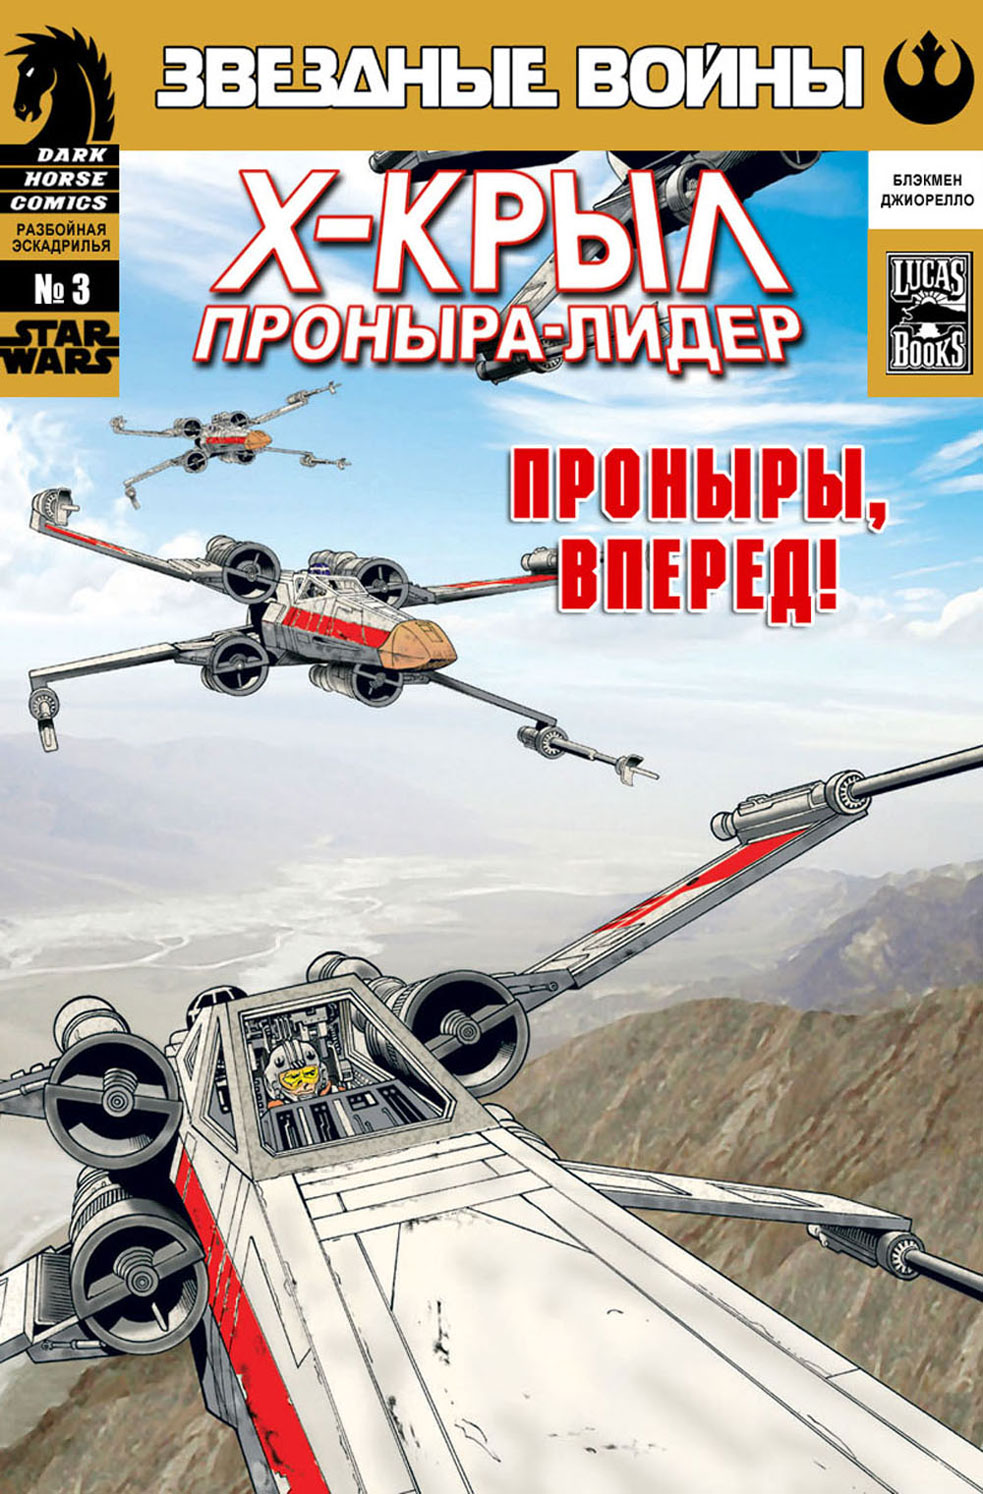 X-wing: Проныра-лидер, часть 3